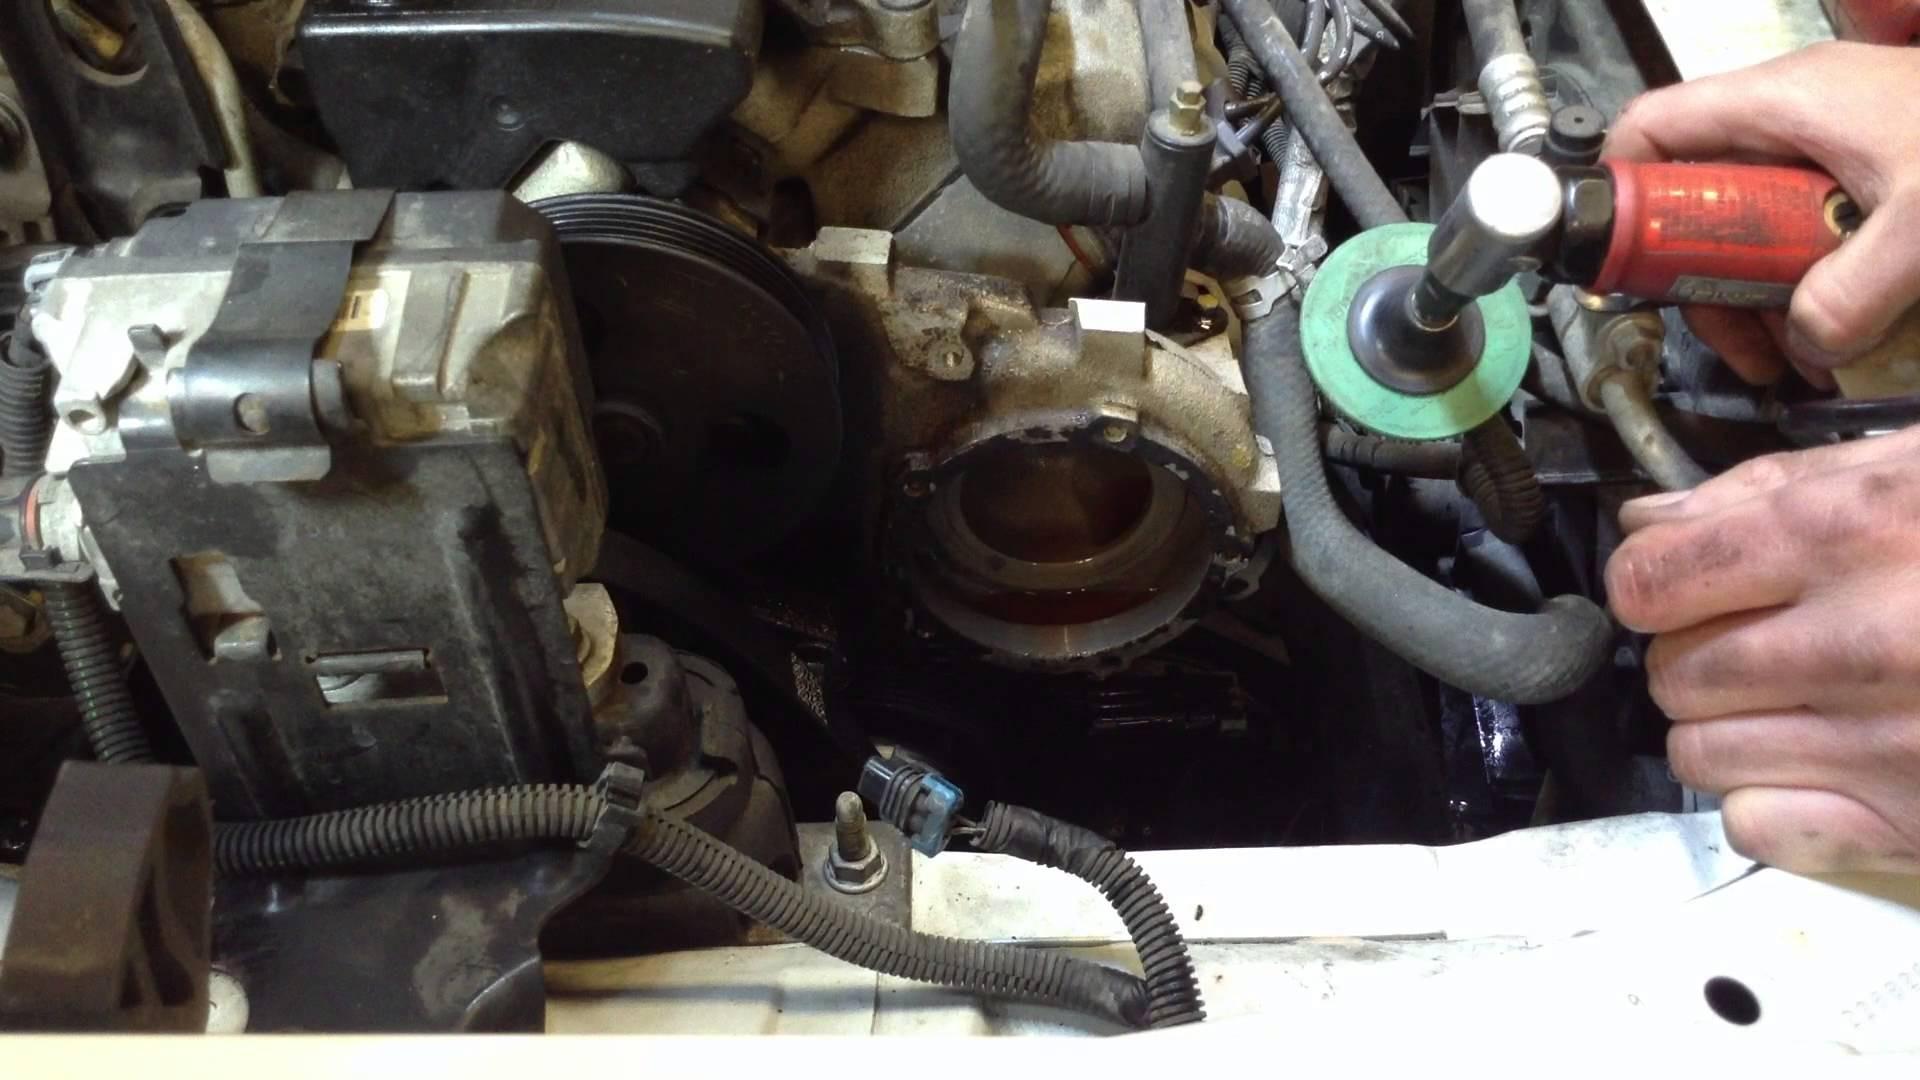 2001 Chevy Malibu 3 1 Engine Diagram 2003 Chevy Malibu Water Pump 3 1 Of  2001